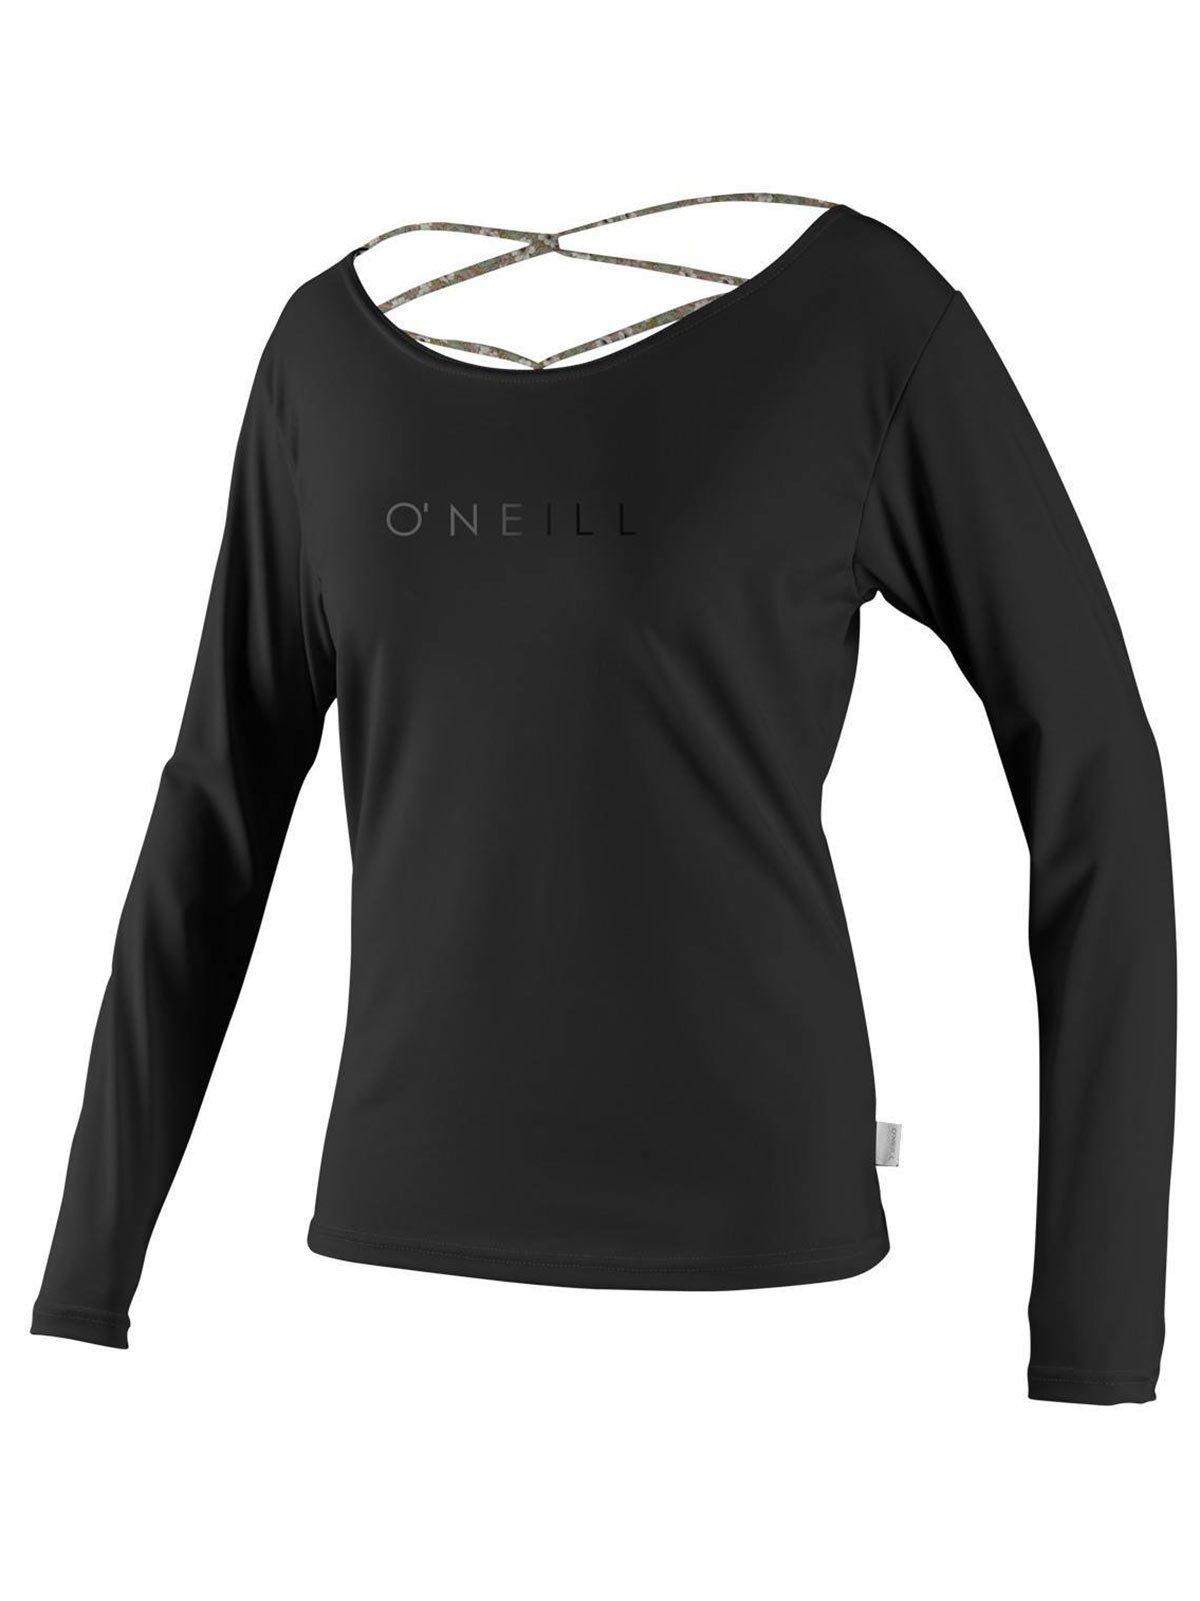 O'Neill Womens Strap Back L/S Rashguard, Black/Floral Black, Small by O'Neill